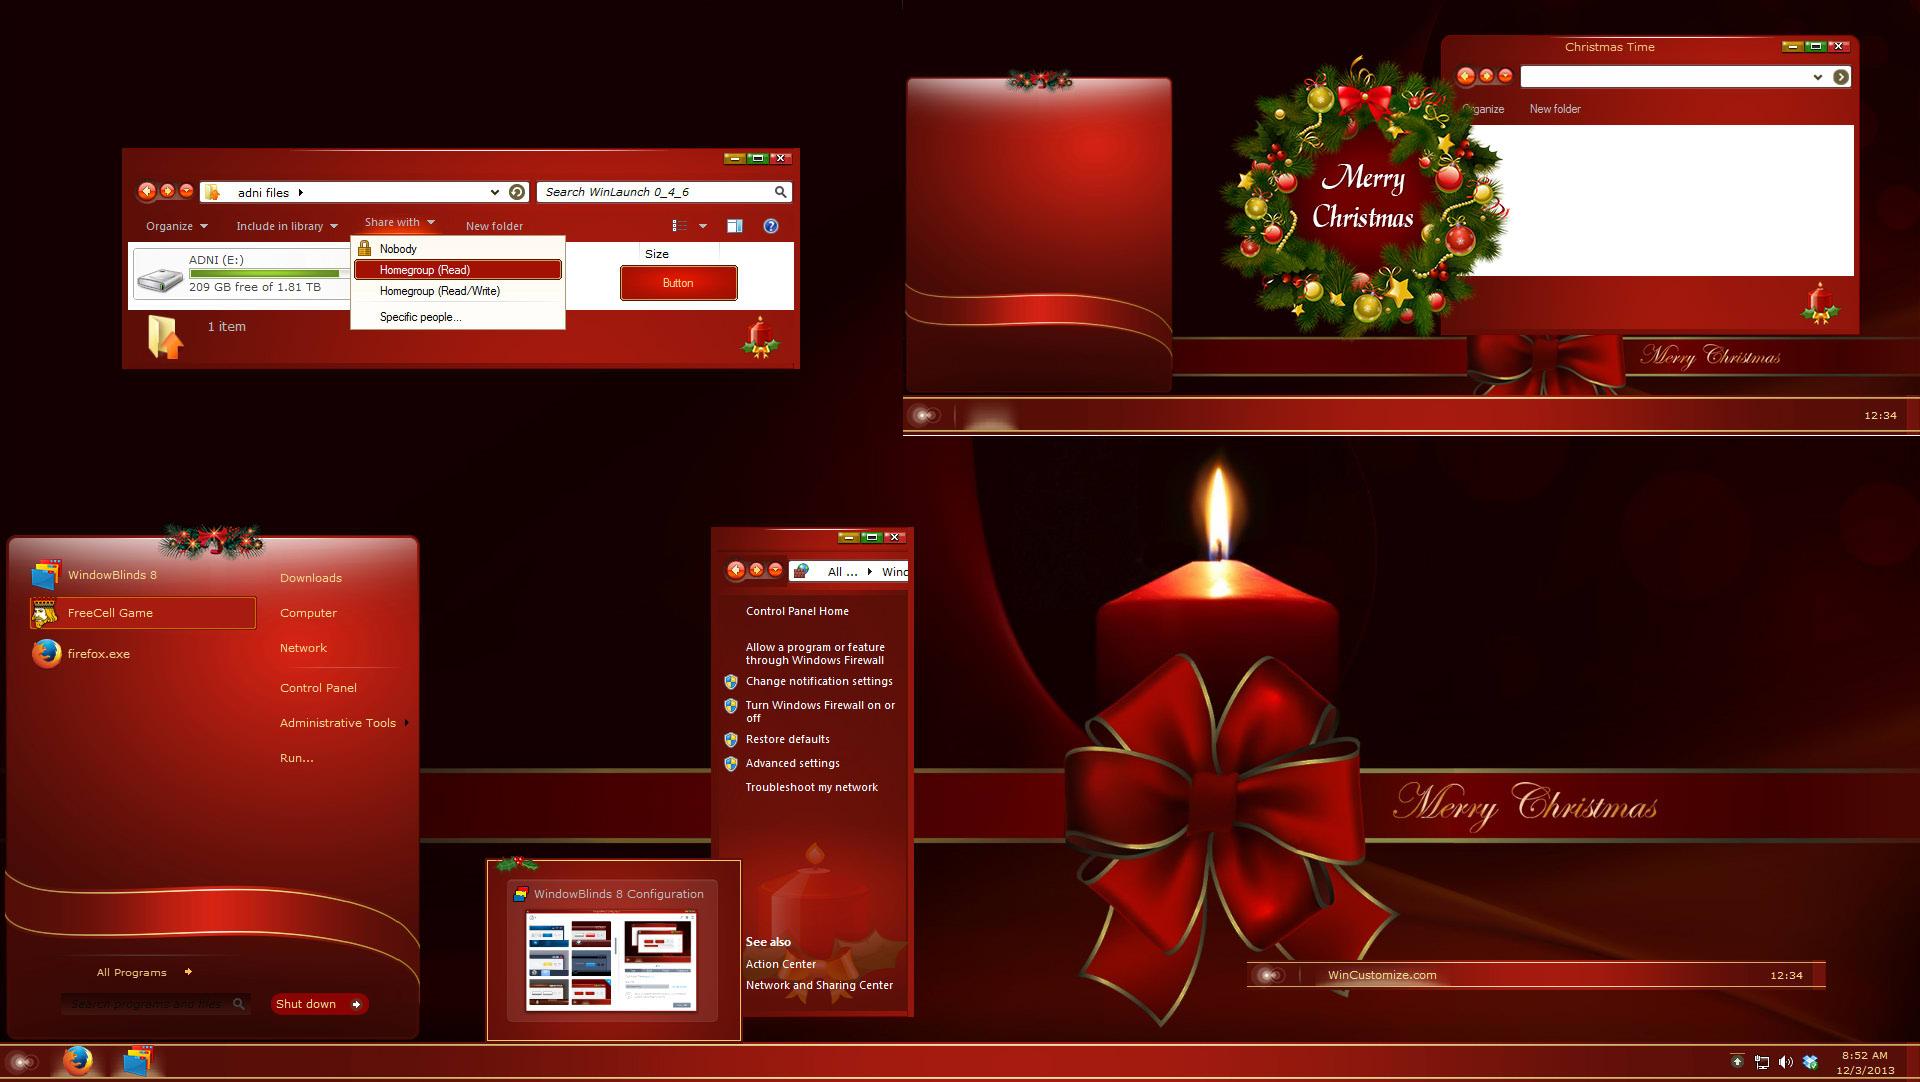 (2.82 MB) Adni Shivrun 320 Kbps Free Mp3 Downloads - izmp3.com